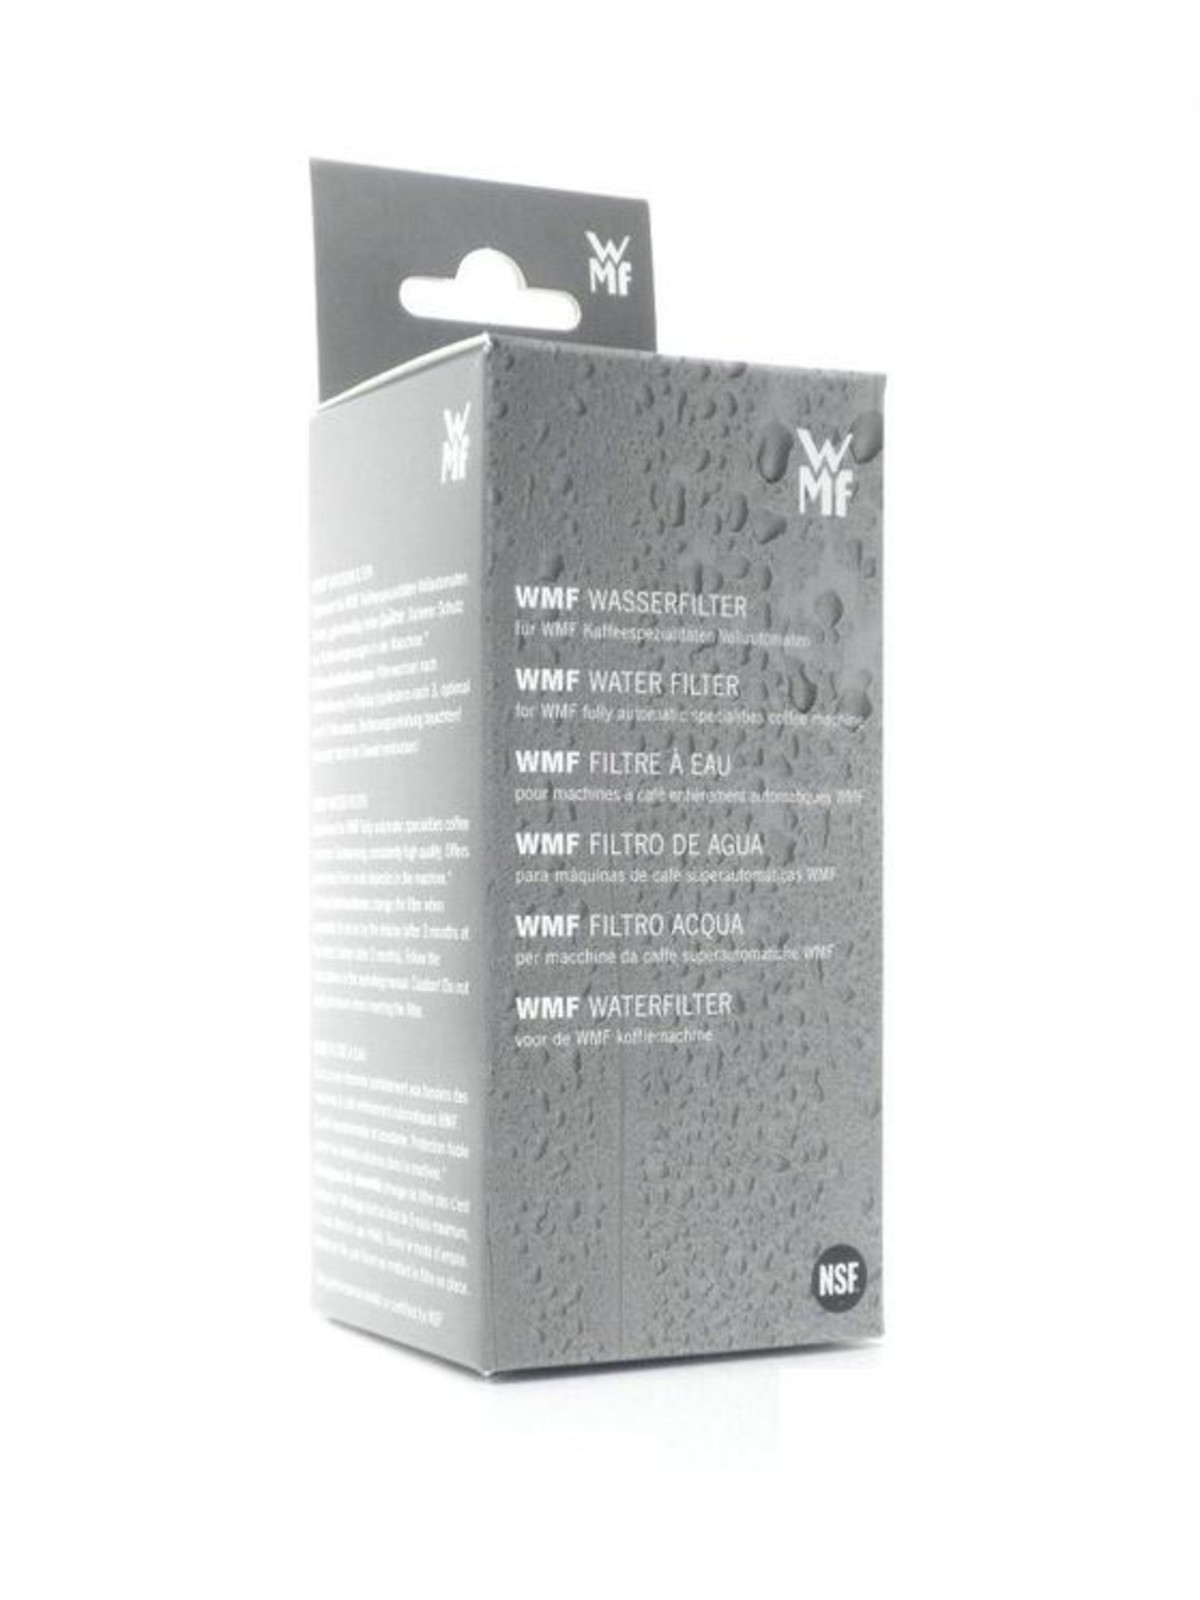 WMF 14 0701 9990 Waterfilter 100ltr